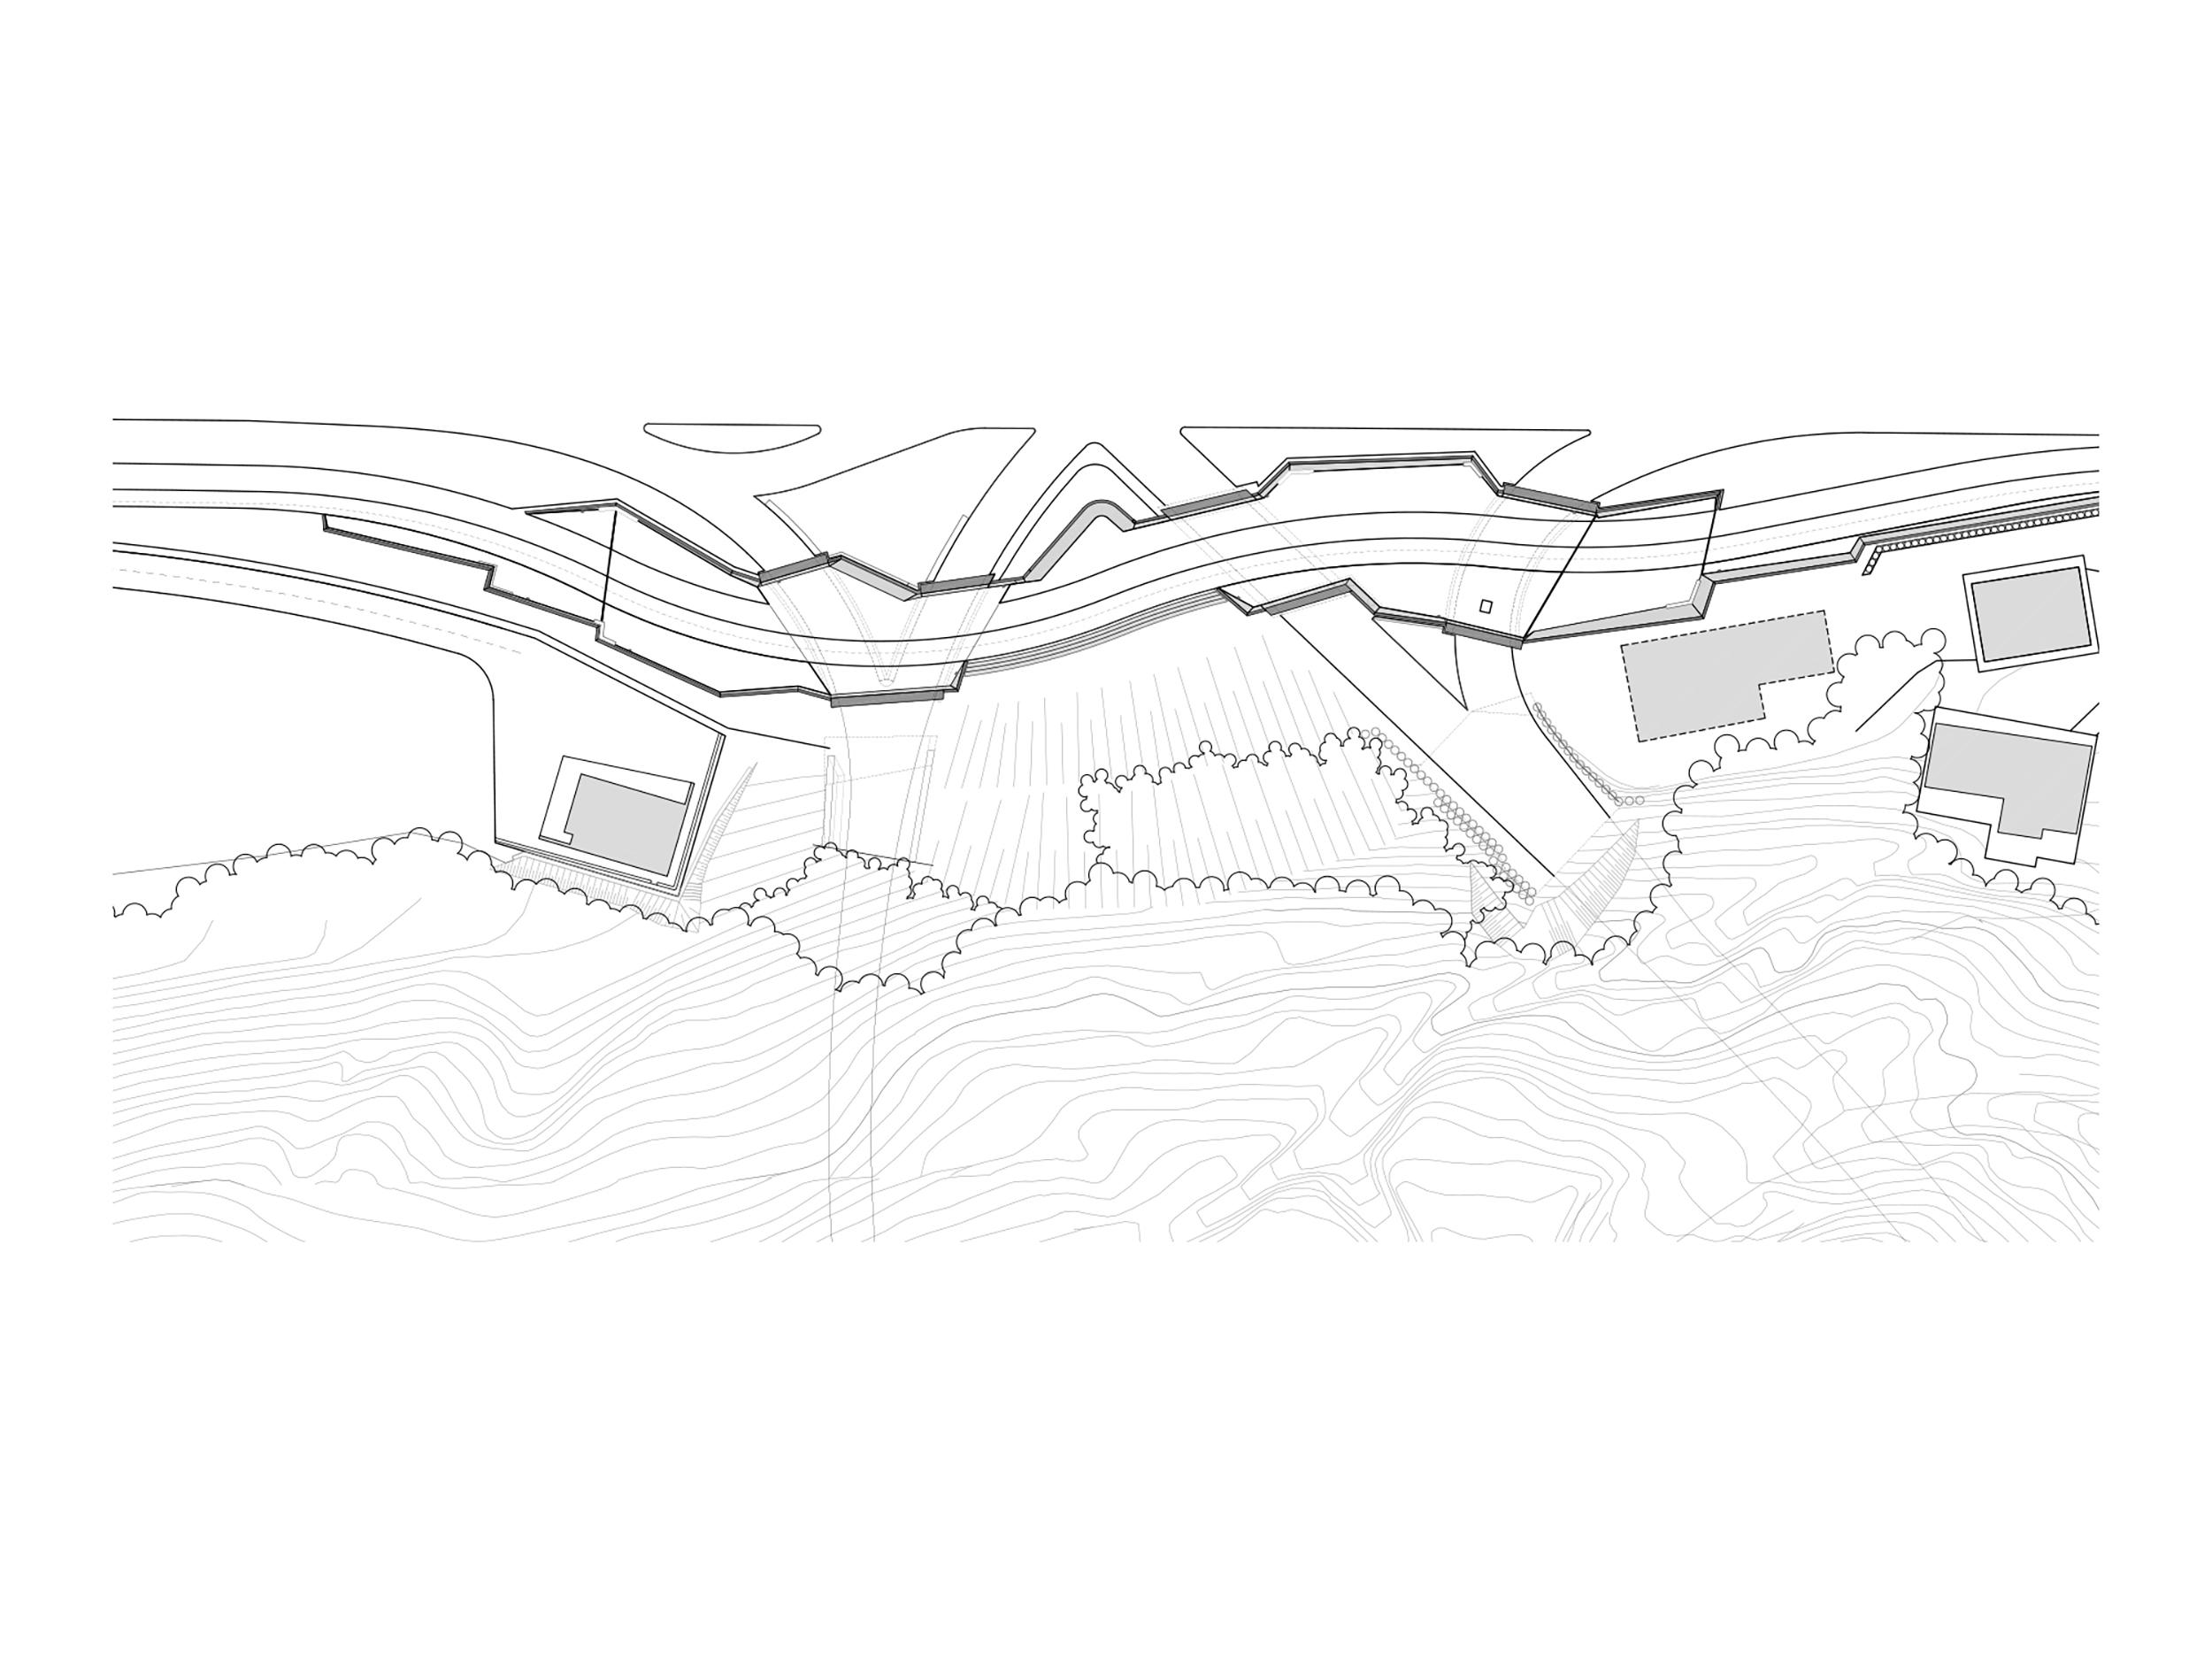 bruto ac park šentvid ljubljana most tunel underpass podhod tloris plan